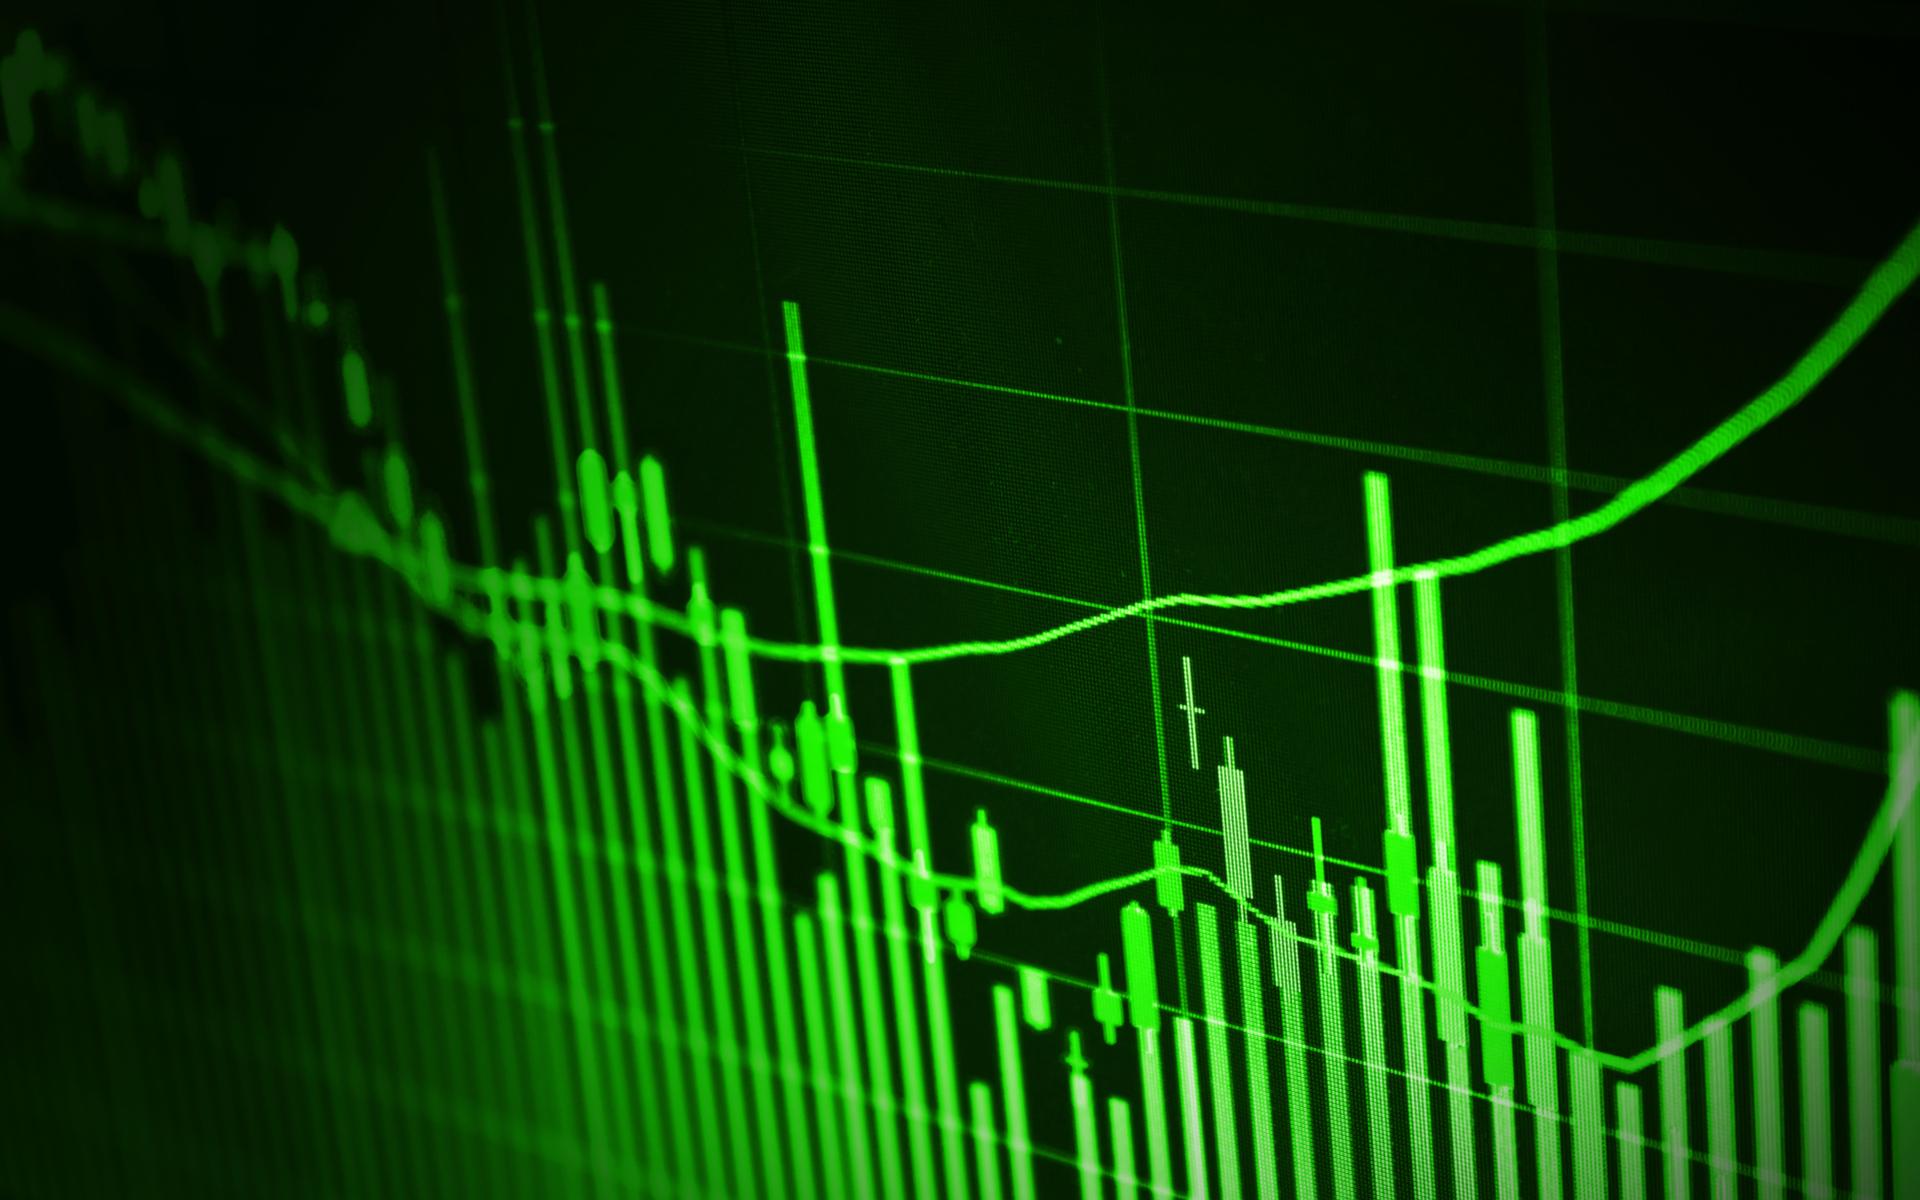 bitcoin btc price rally q4